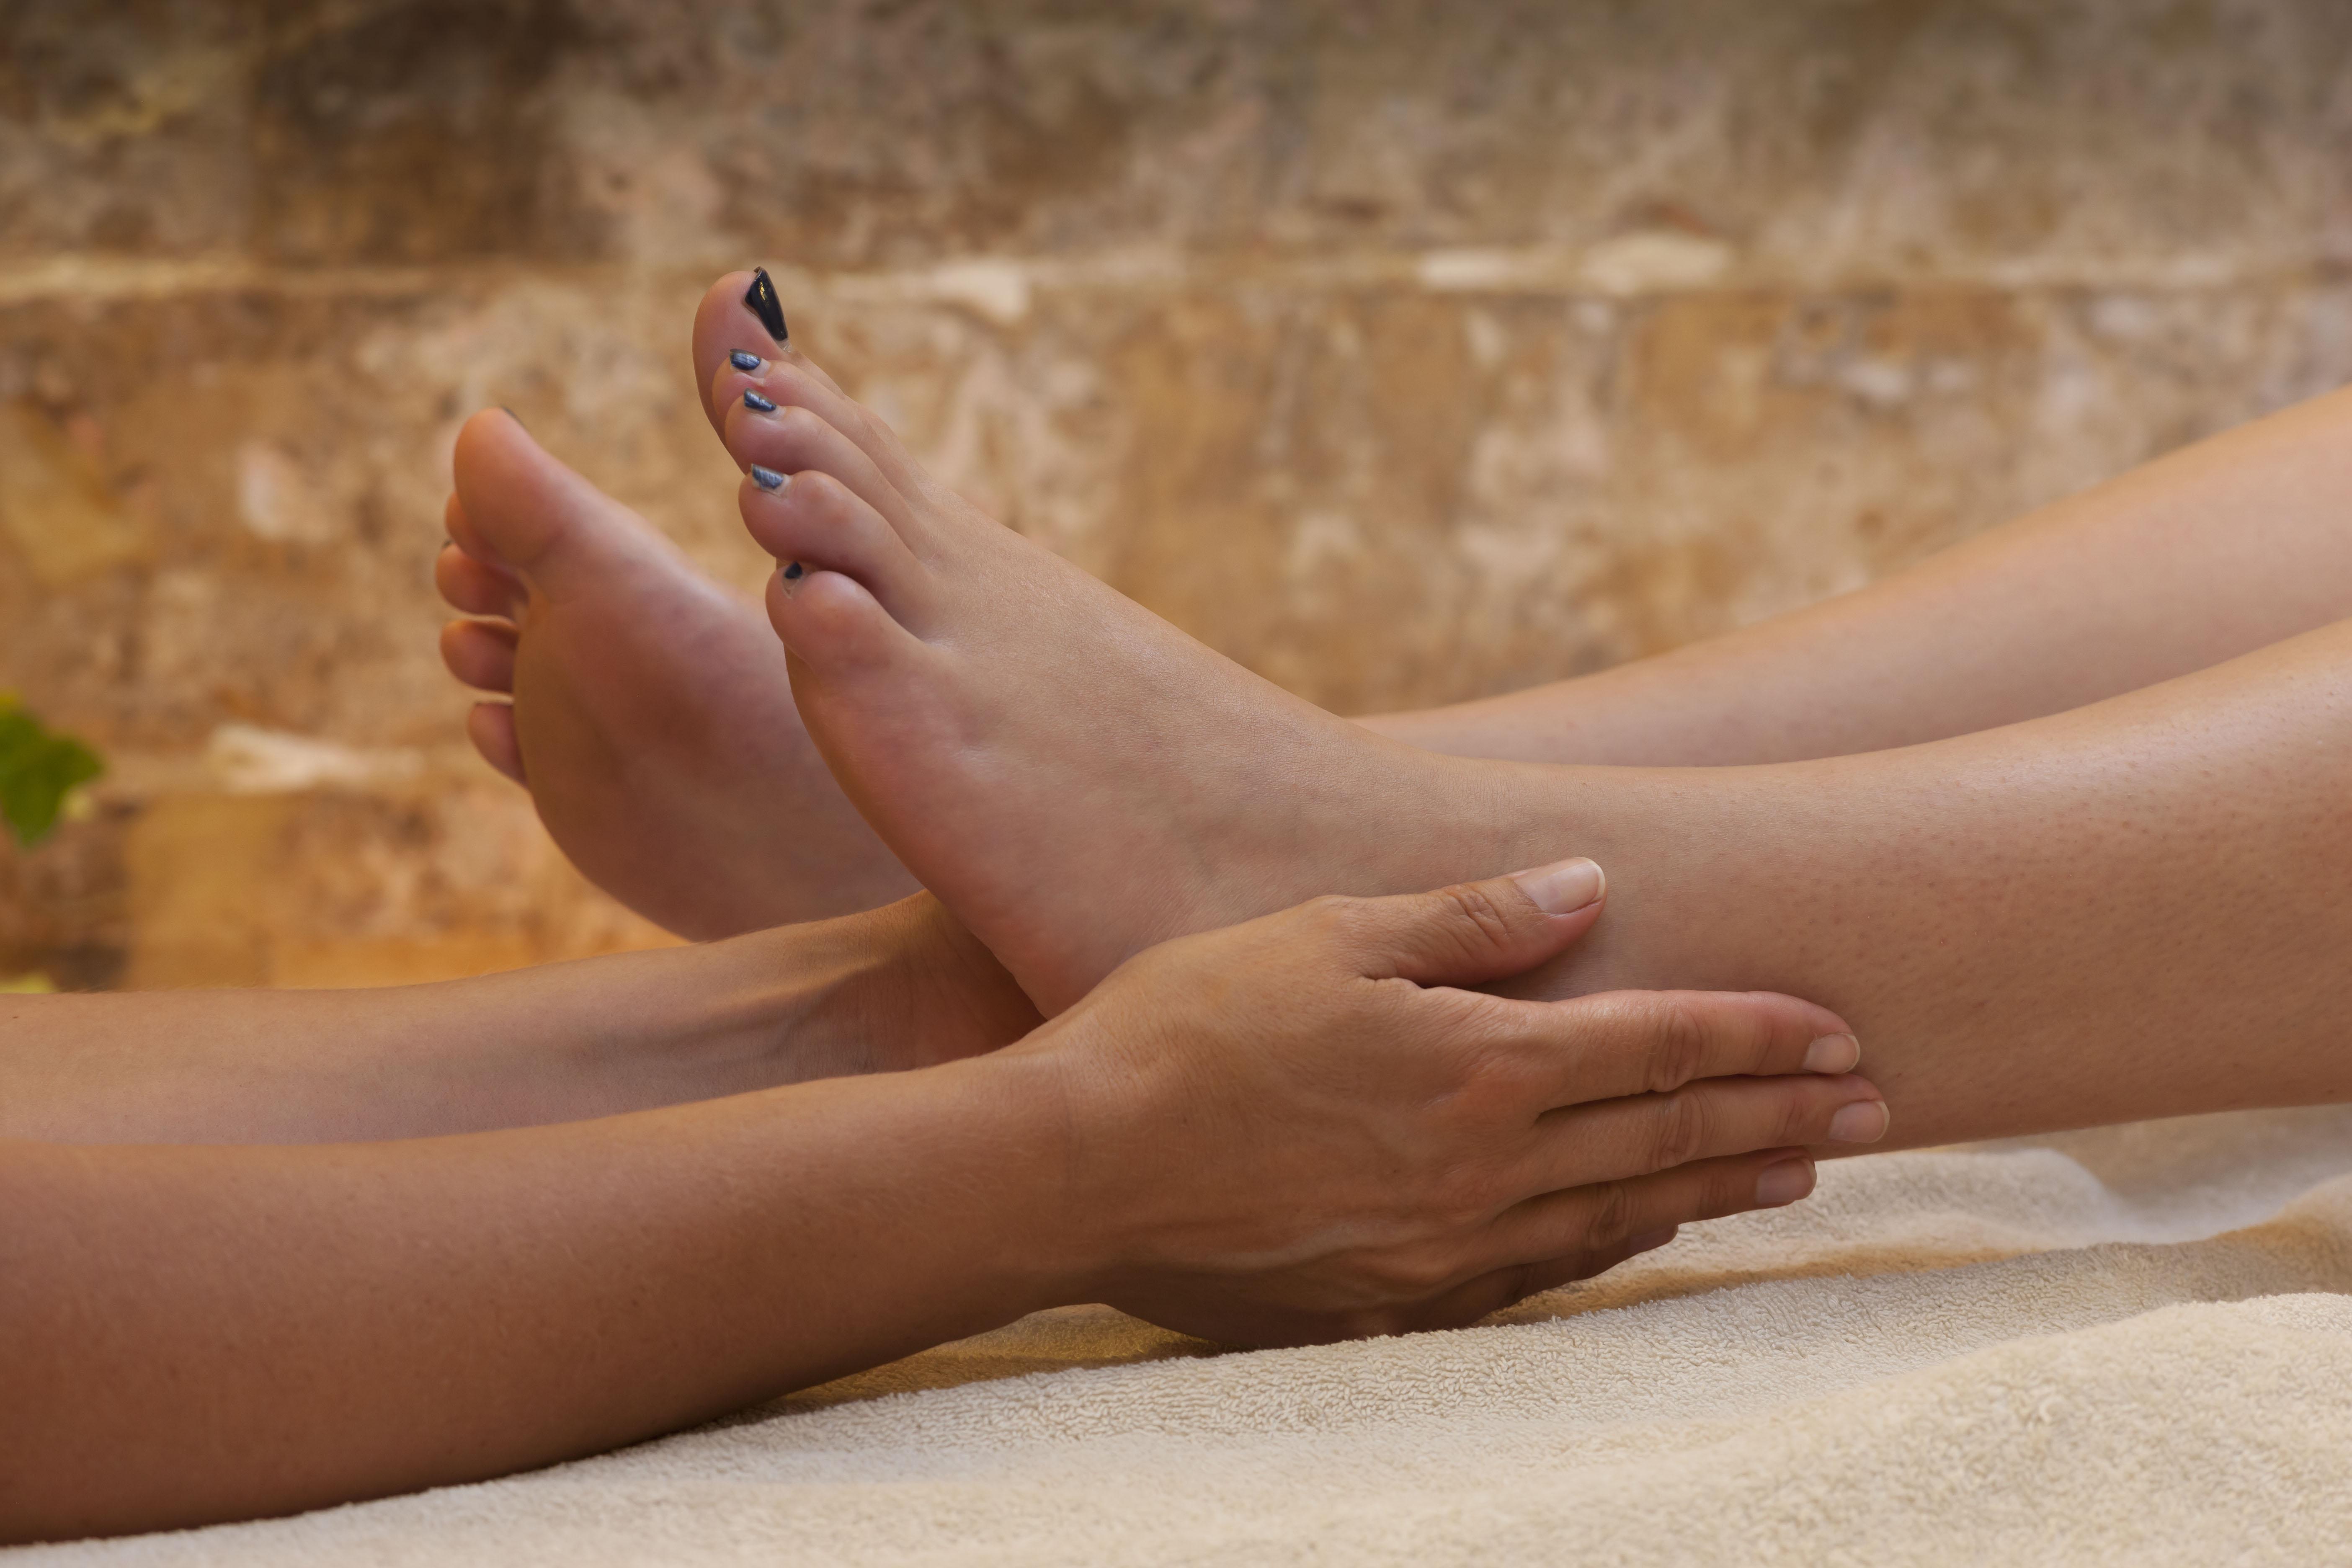 Картинки женские ножки в домашних условиях